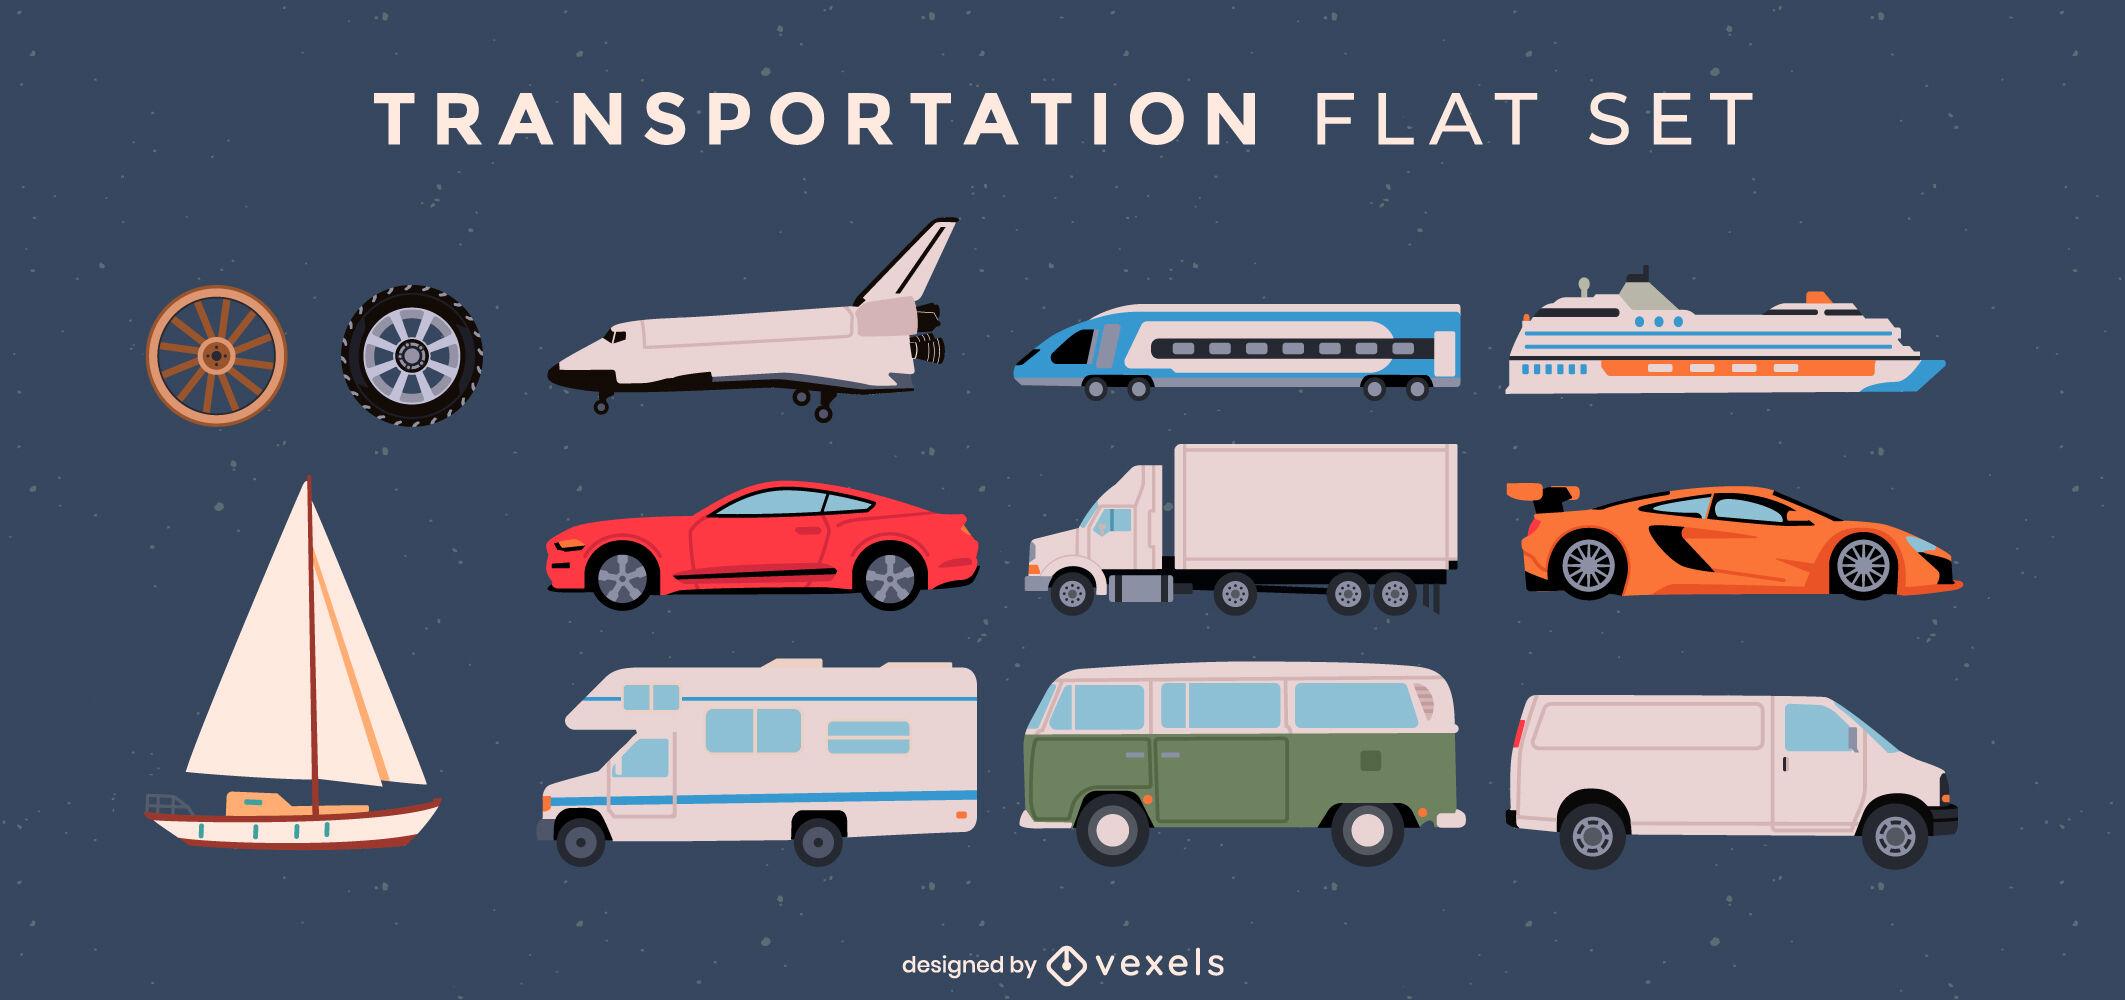 Transportation elements flat set